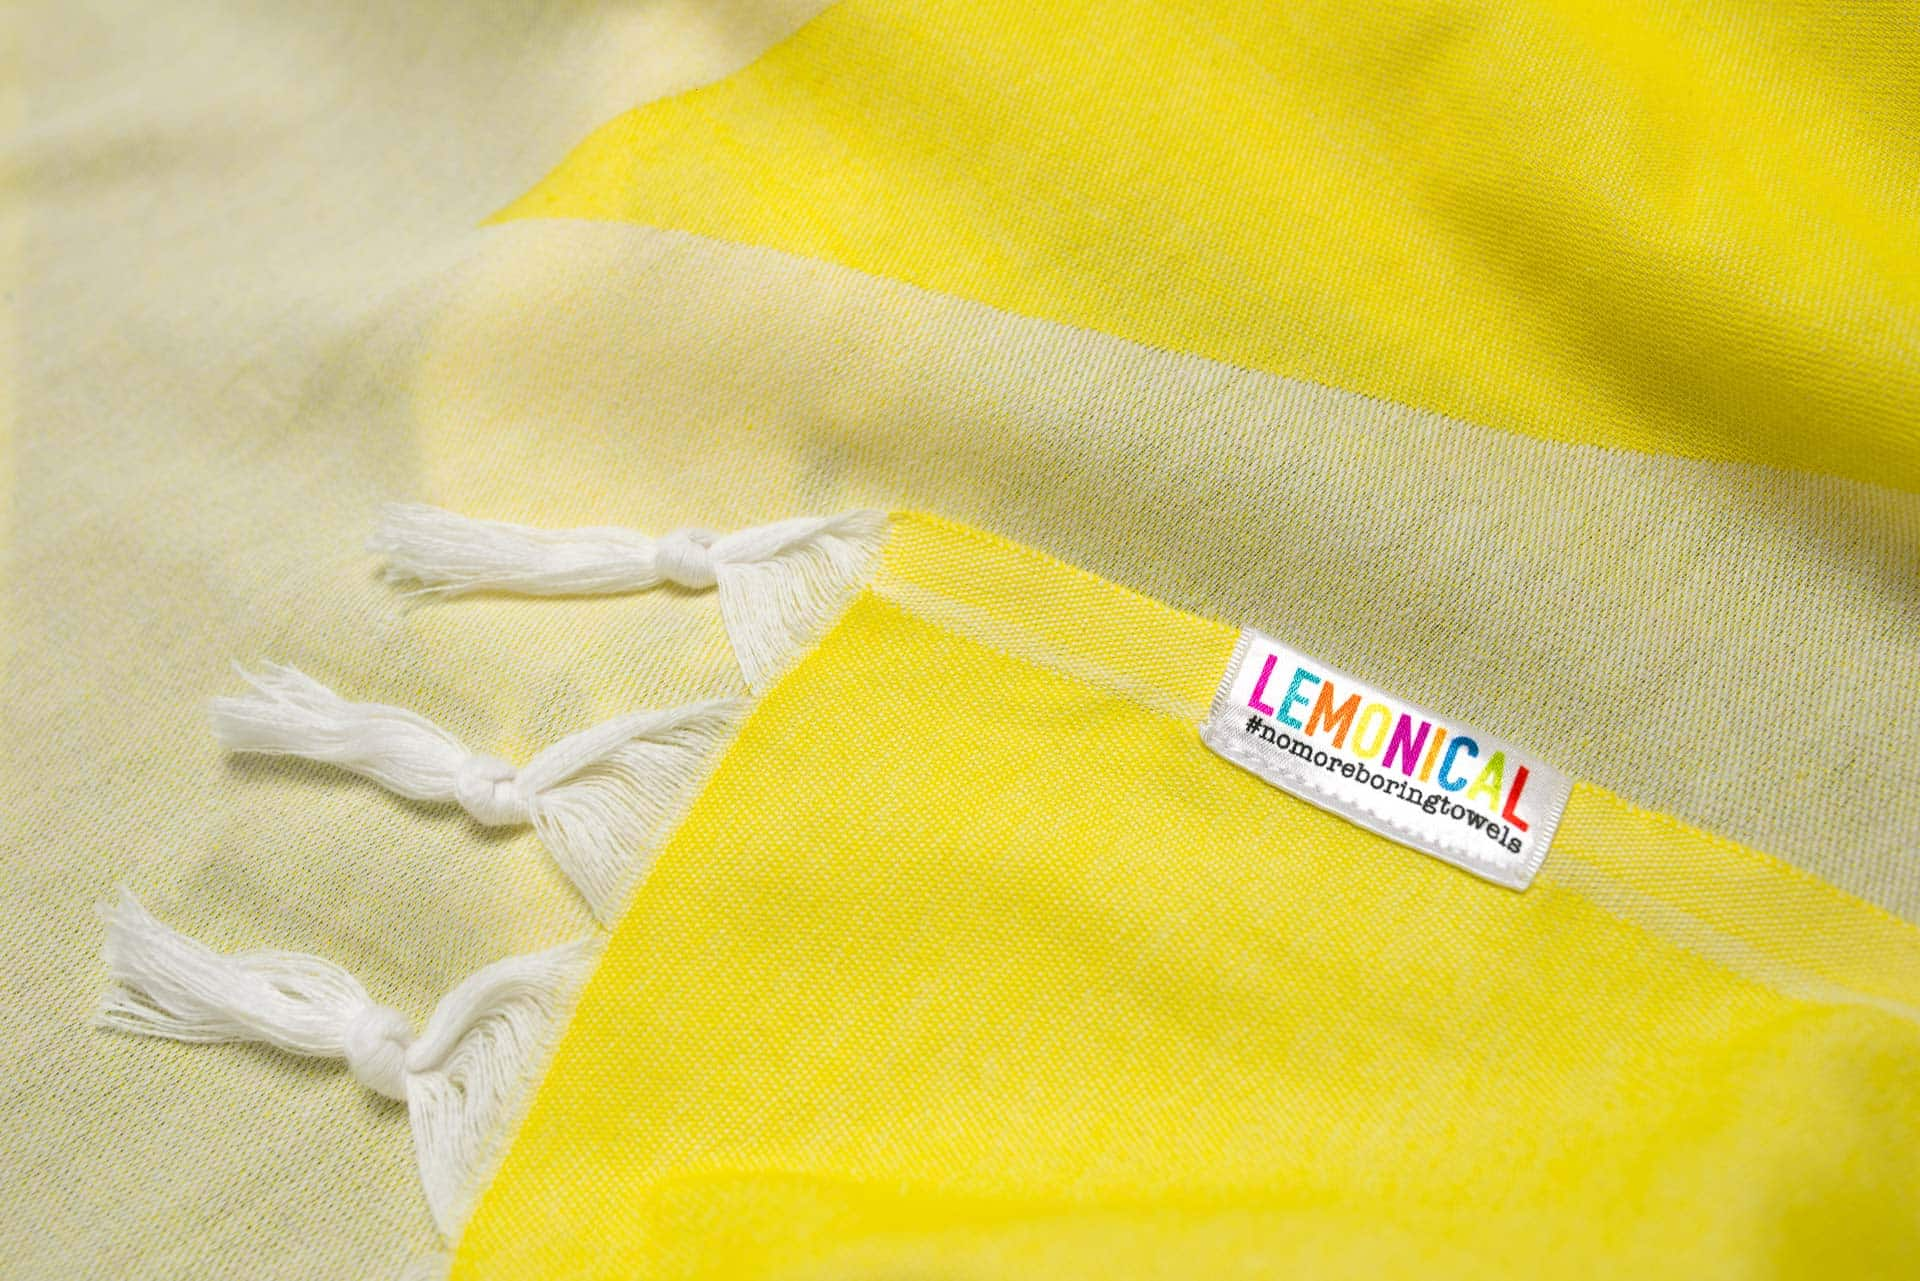 YELLOW-STARFISH-Towel-Lemonical-3